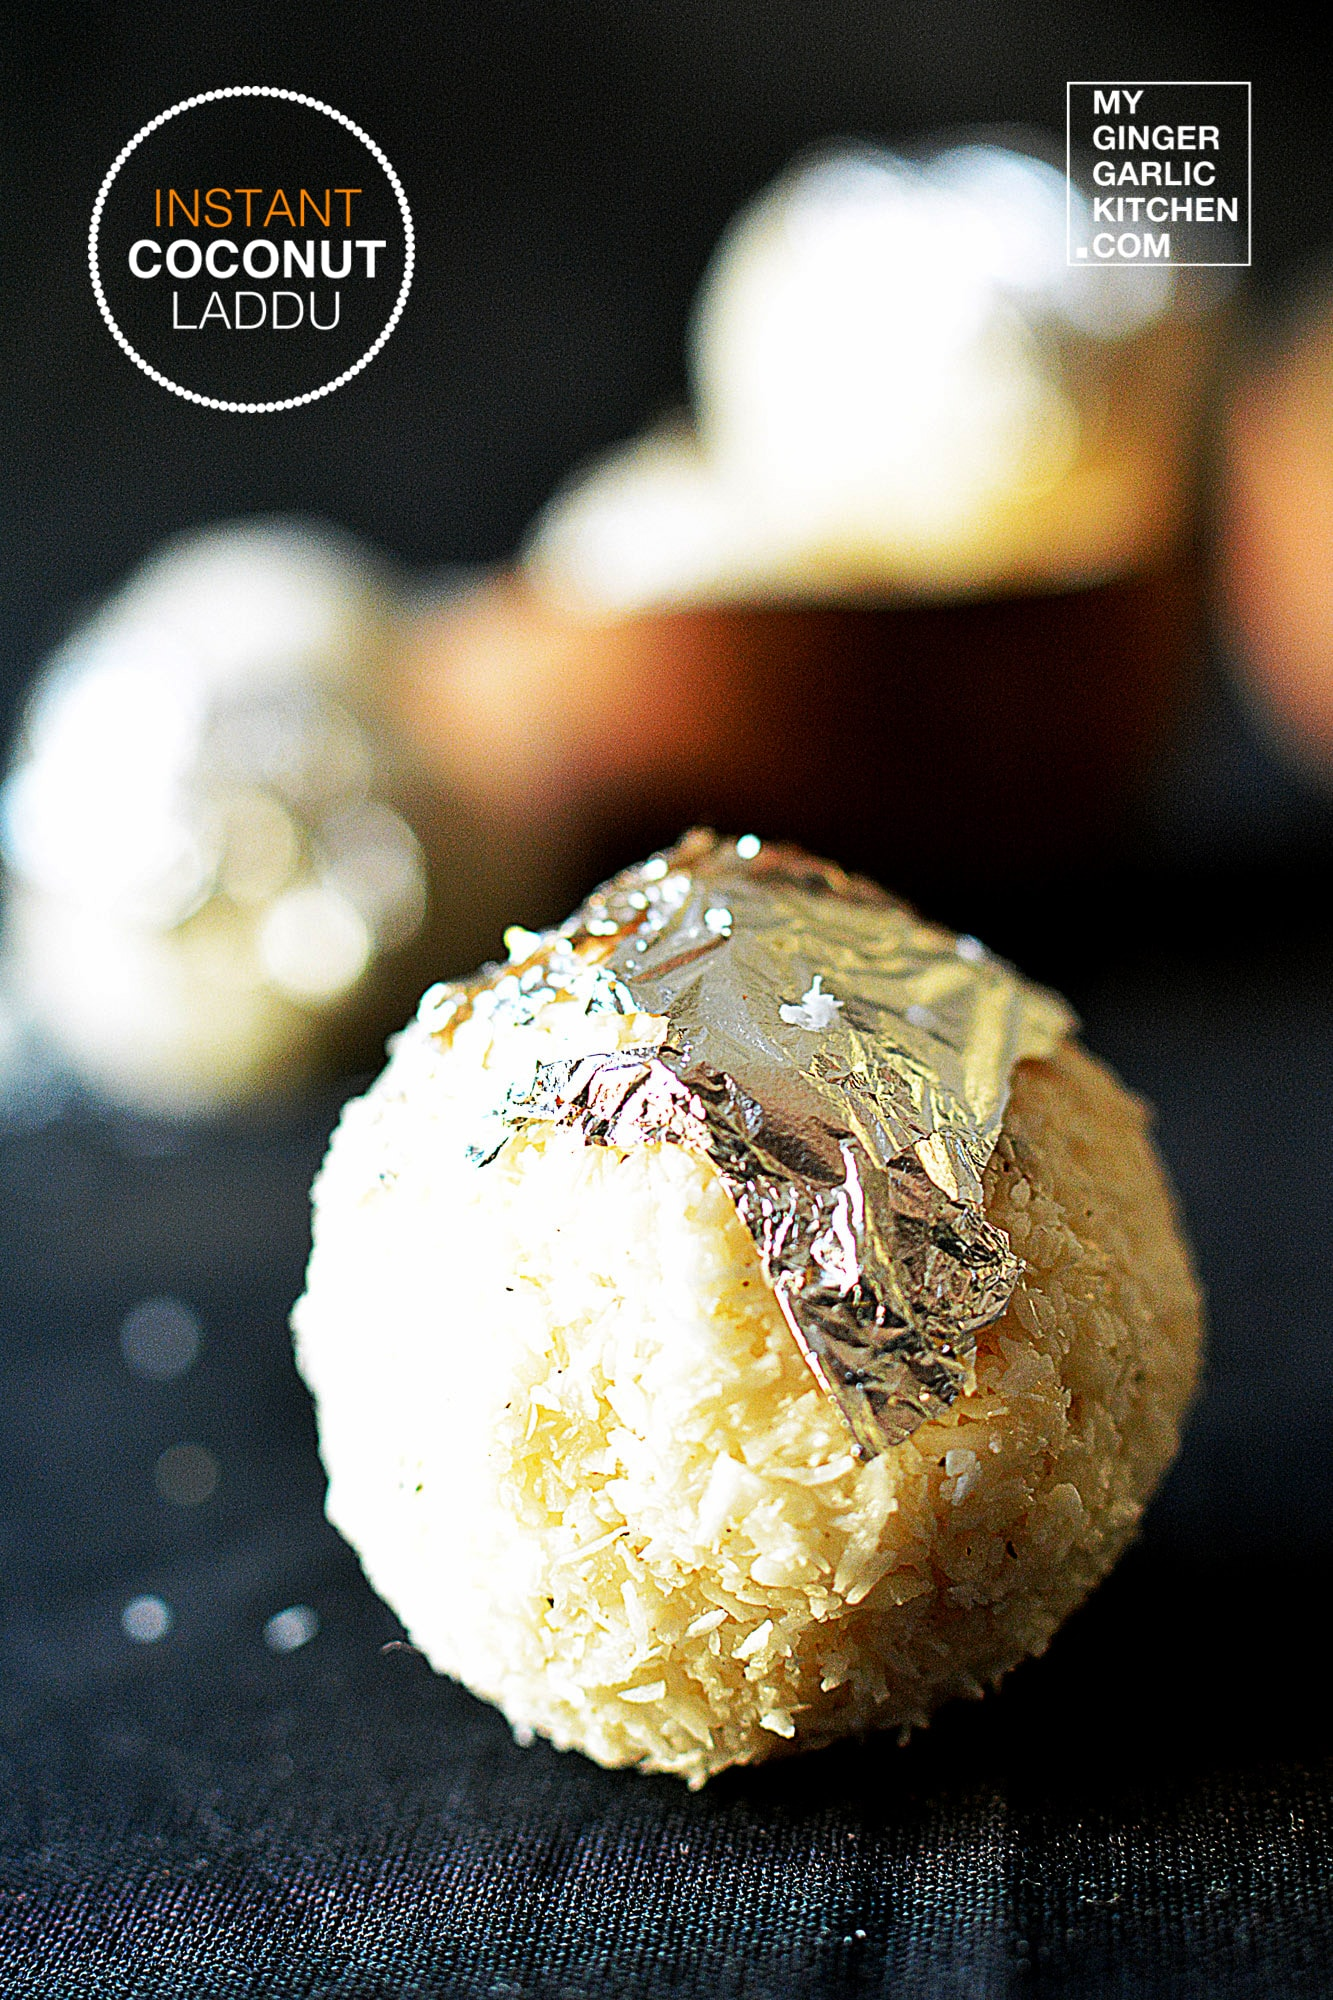 Image - recipe instant coconut laddu anupama paliwal my ginger garlic kitchen 1